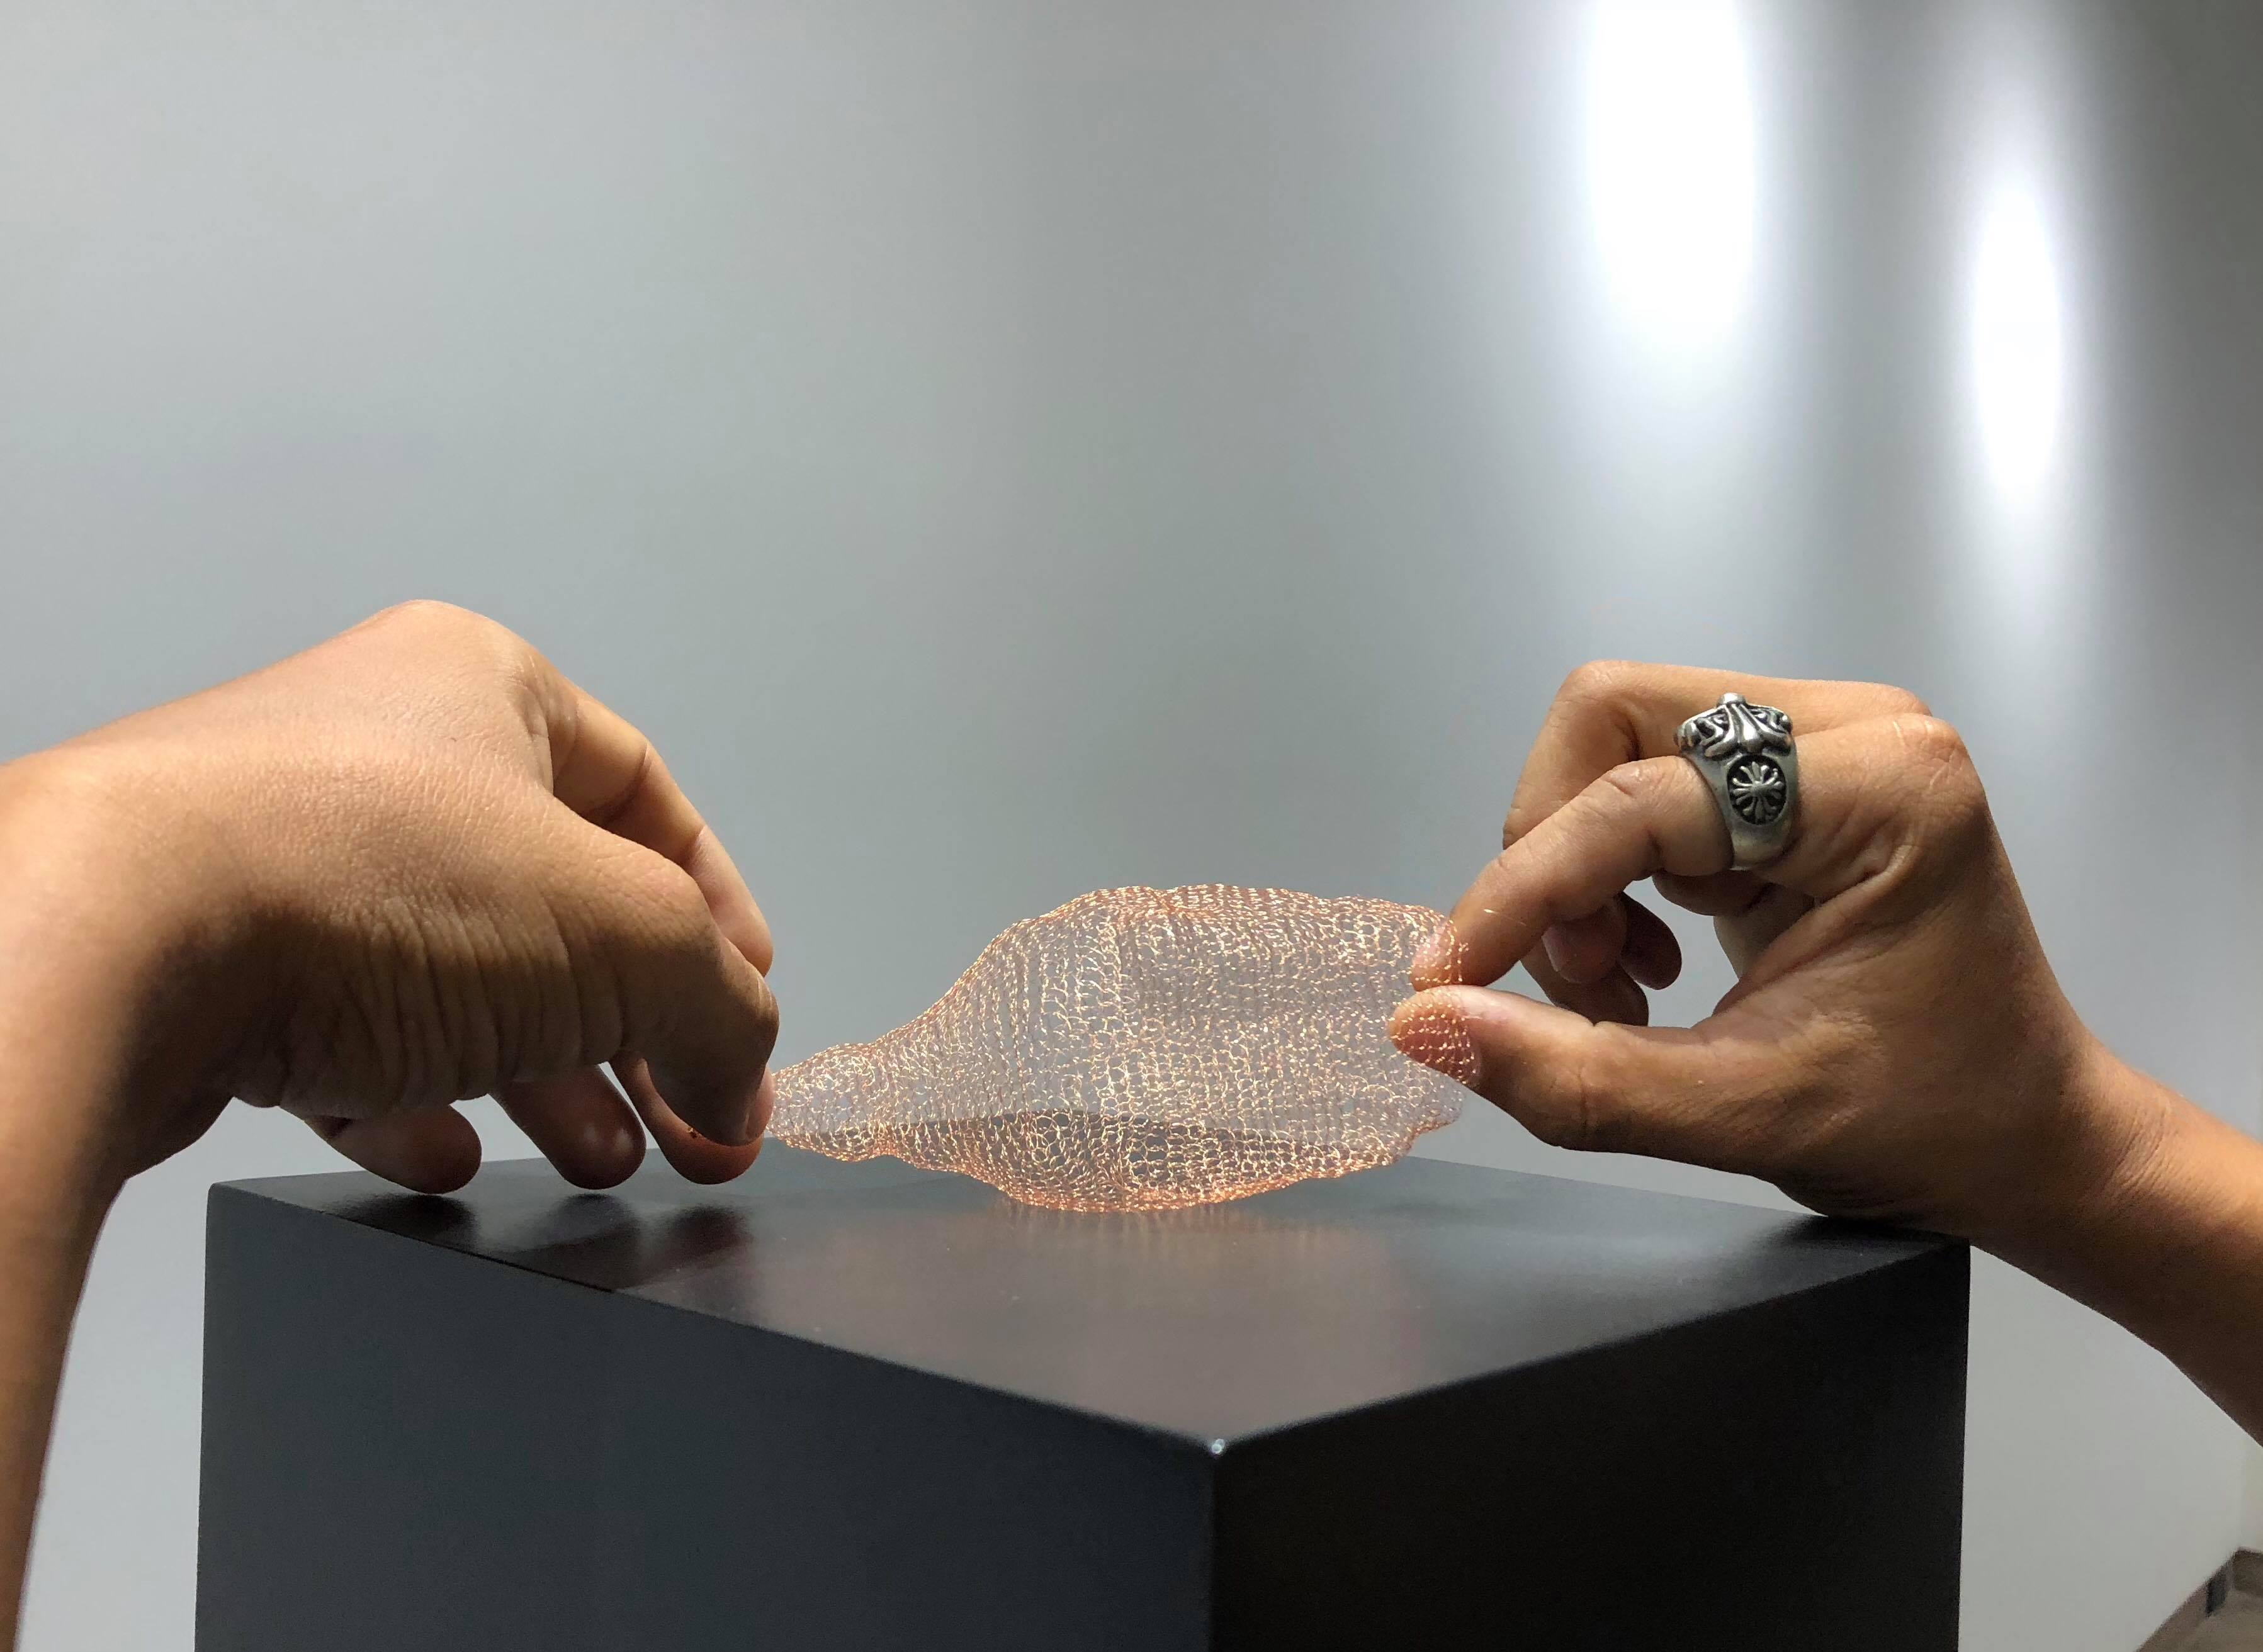 Teerapon Srisung ศรัทธา 01, 2018, ผลงาน 5 x 15 x 9 cm. ฐาน-กระจก 50 x 50 x 170 cm., ถักเส้นใยโลหะ